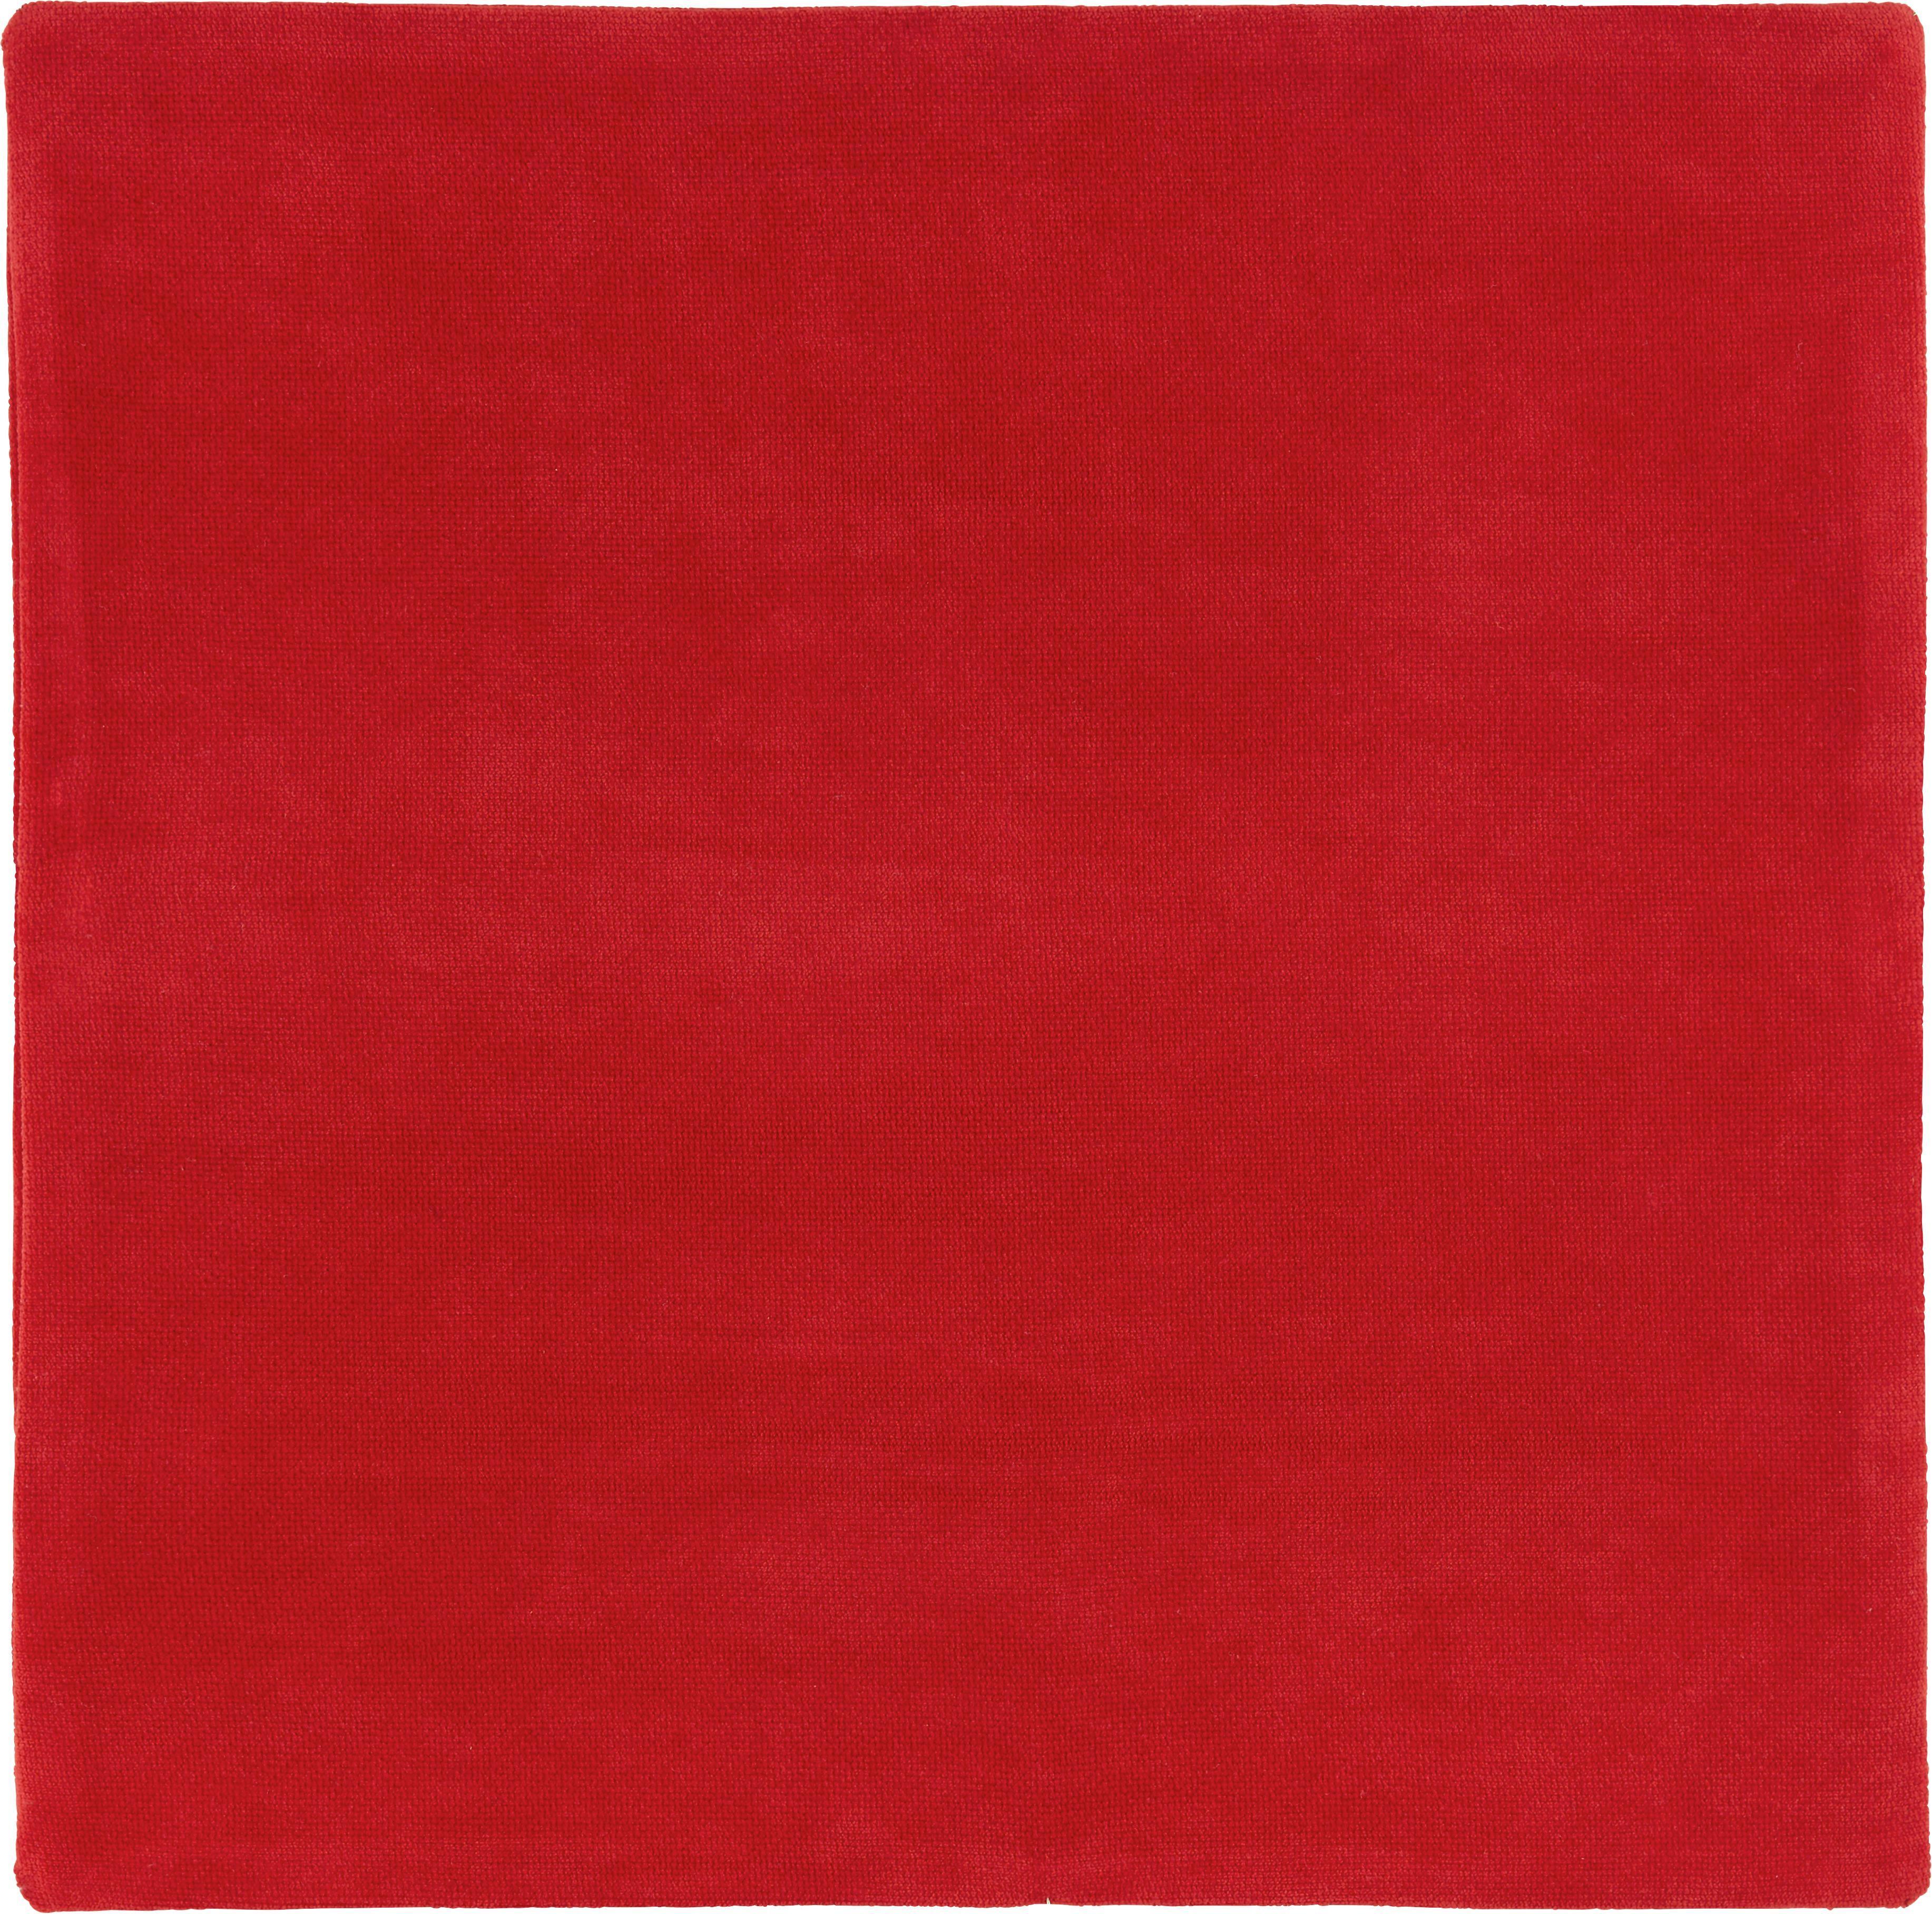 Kissenhülle Marit, ca. 40x40cm - Rot, Textil (40/40cm) - MÖMAX modern living